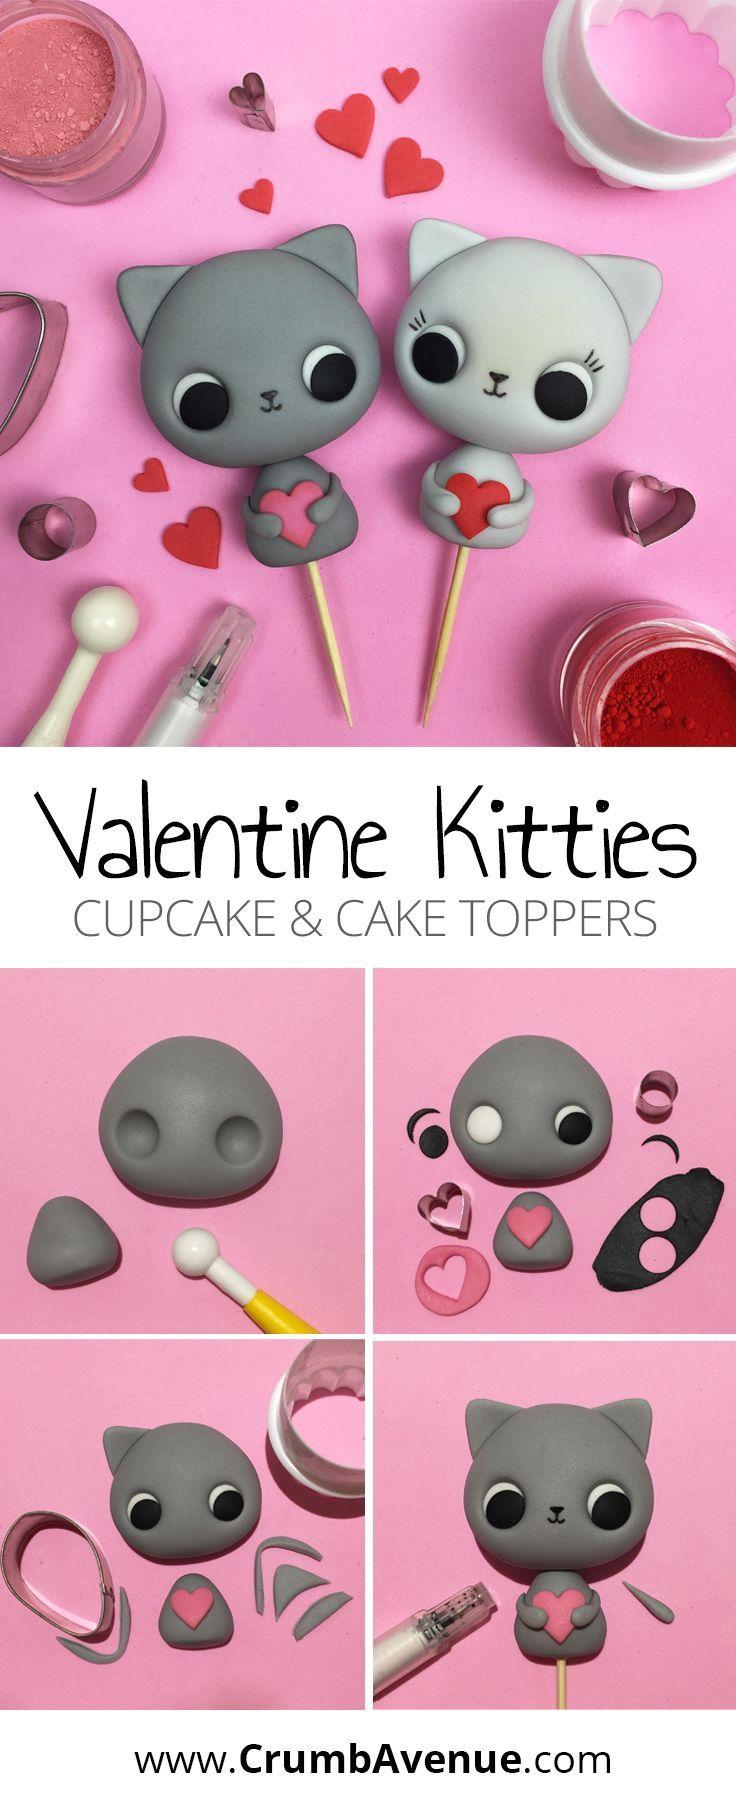 Cute Valentine Kitties – Cake Topper Tutorial / Katze, Katzen, Kitty, Figur, Figuren …  #katze #katzen #kitties #kitty #topper